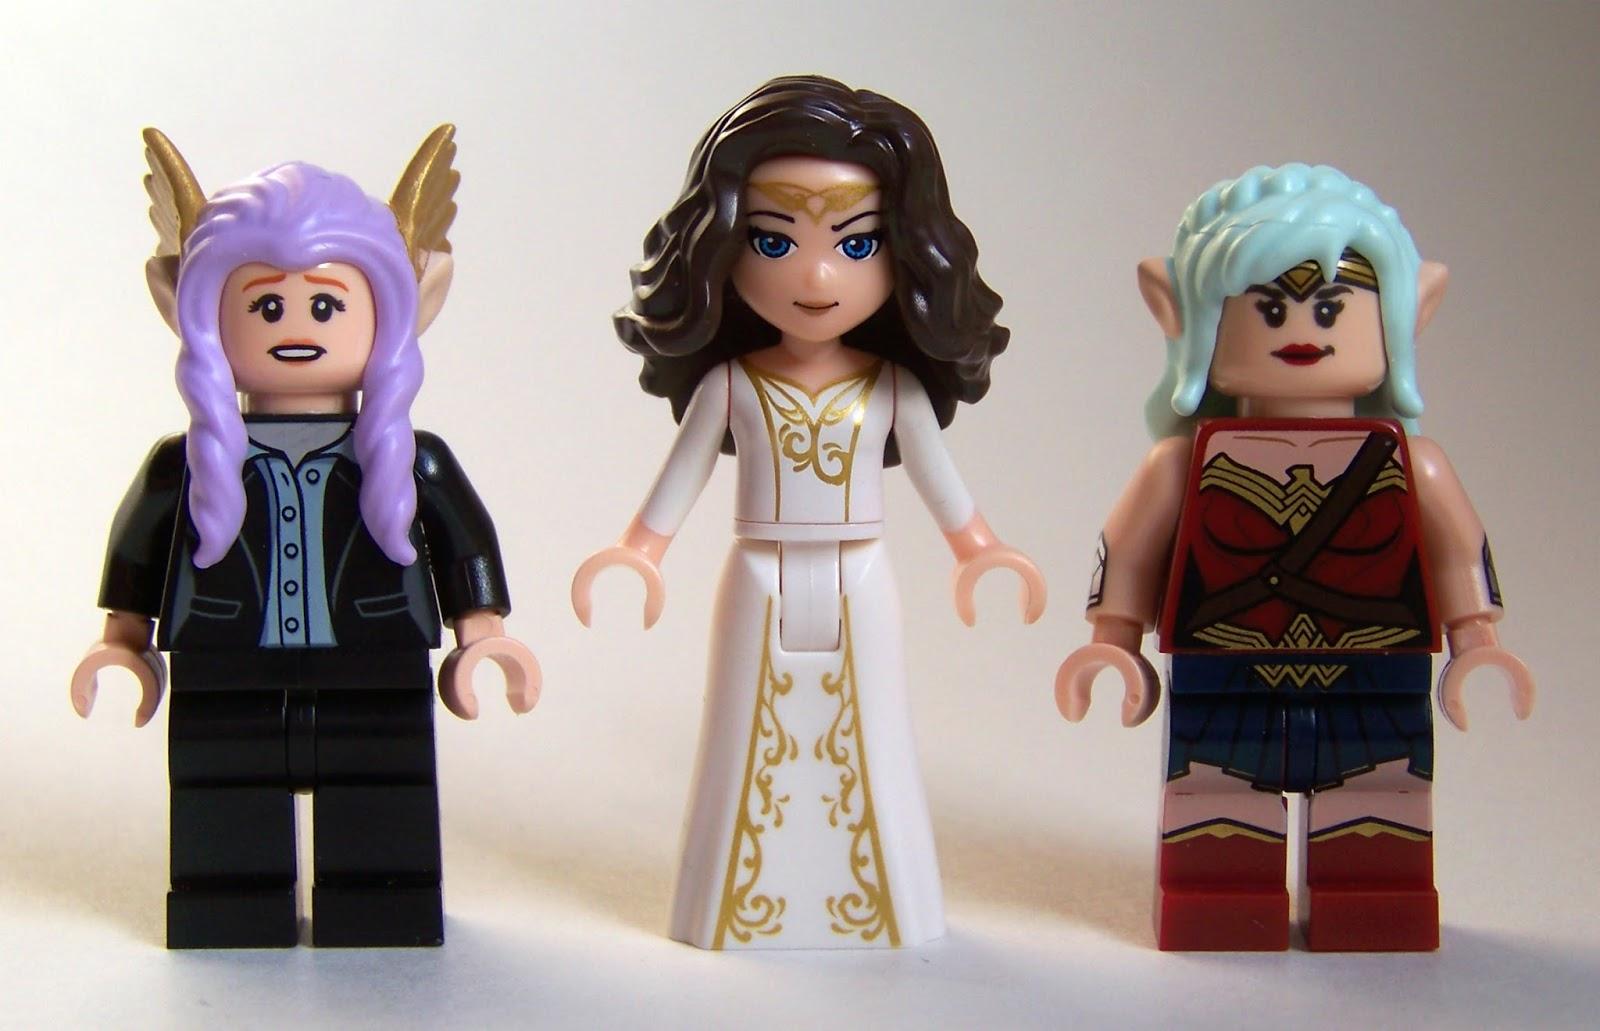 Cavort Fun With Hair Wonderwoman Elves Skyra S